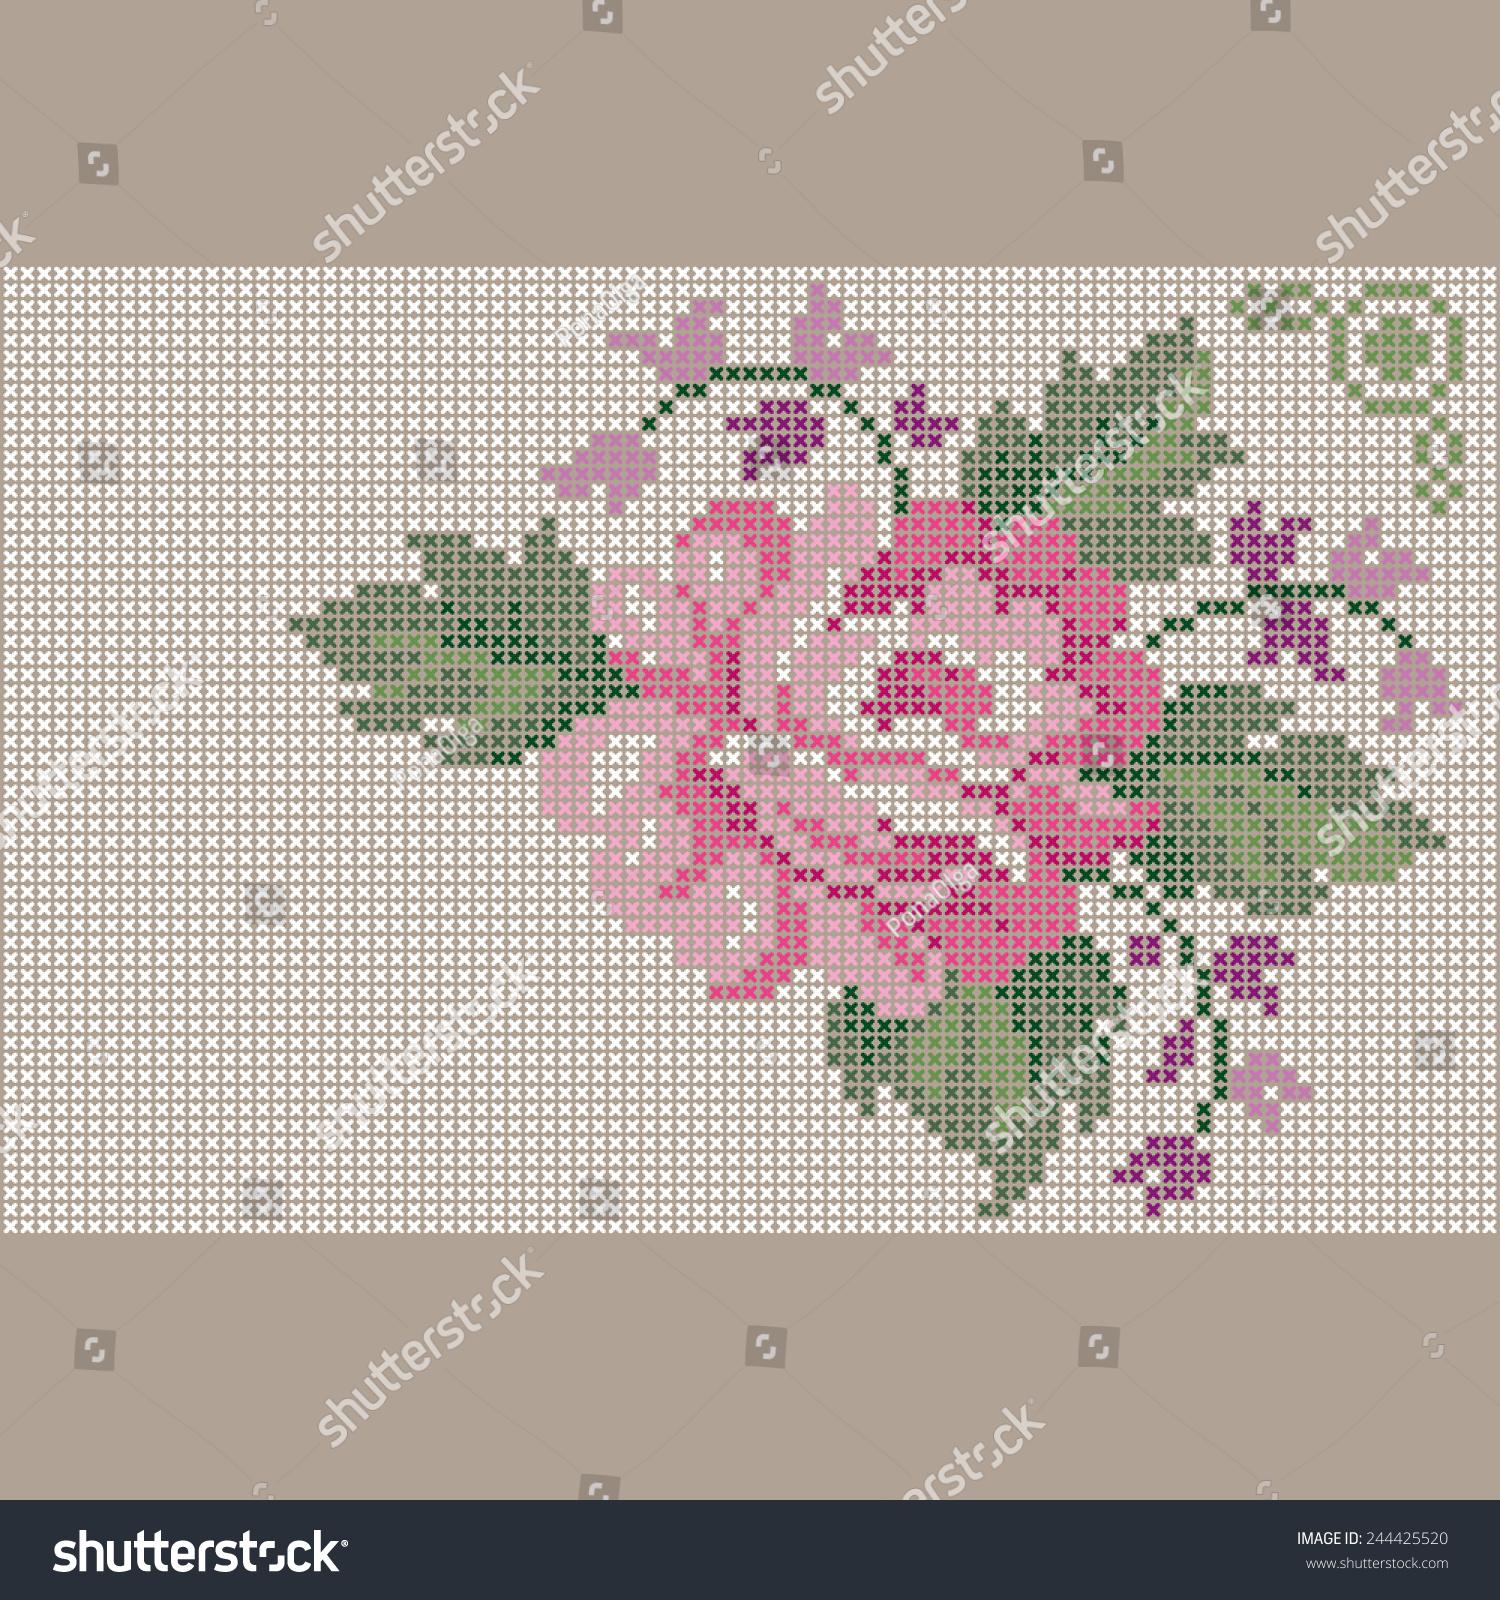 Stitch Cross Rose Stock Vector Illustration 244425520 : Shutterstock